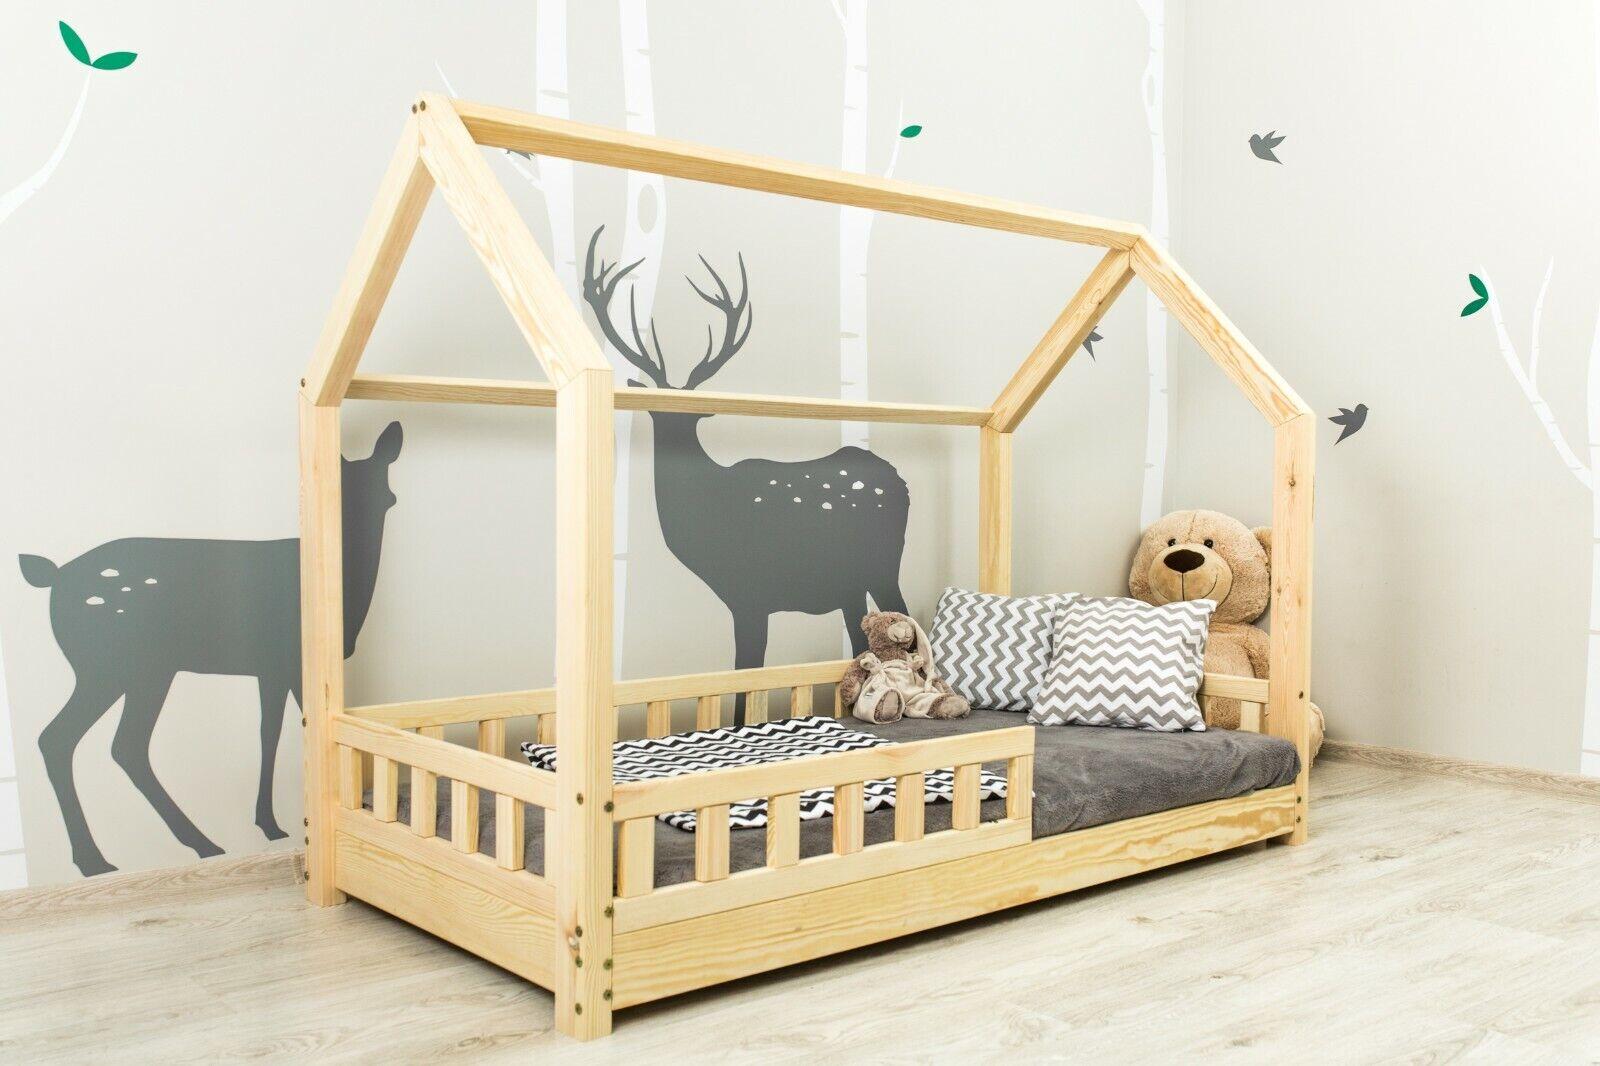 Toddler Bed Frame Furniture Kids Boys Girls Wood Pirate Ship Headboard Design For Sale Ebay